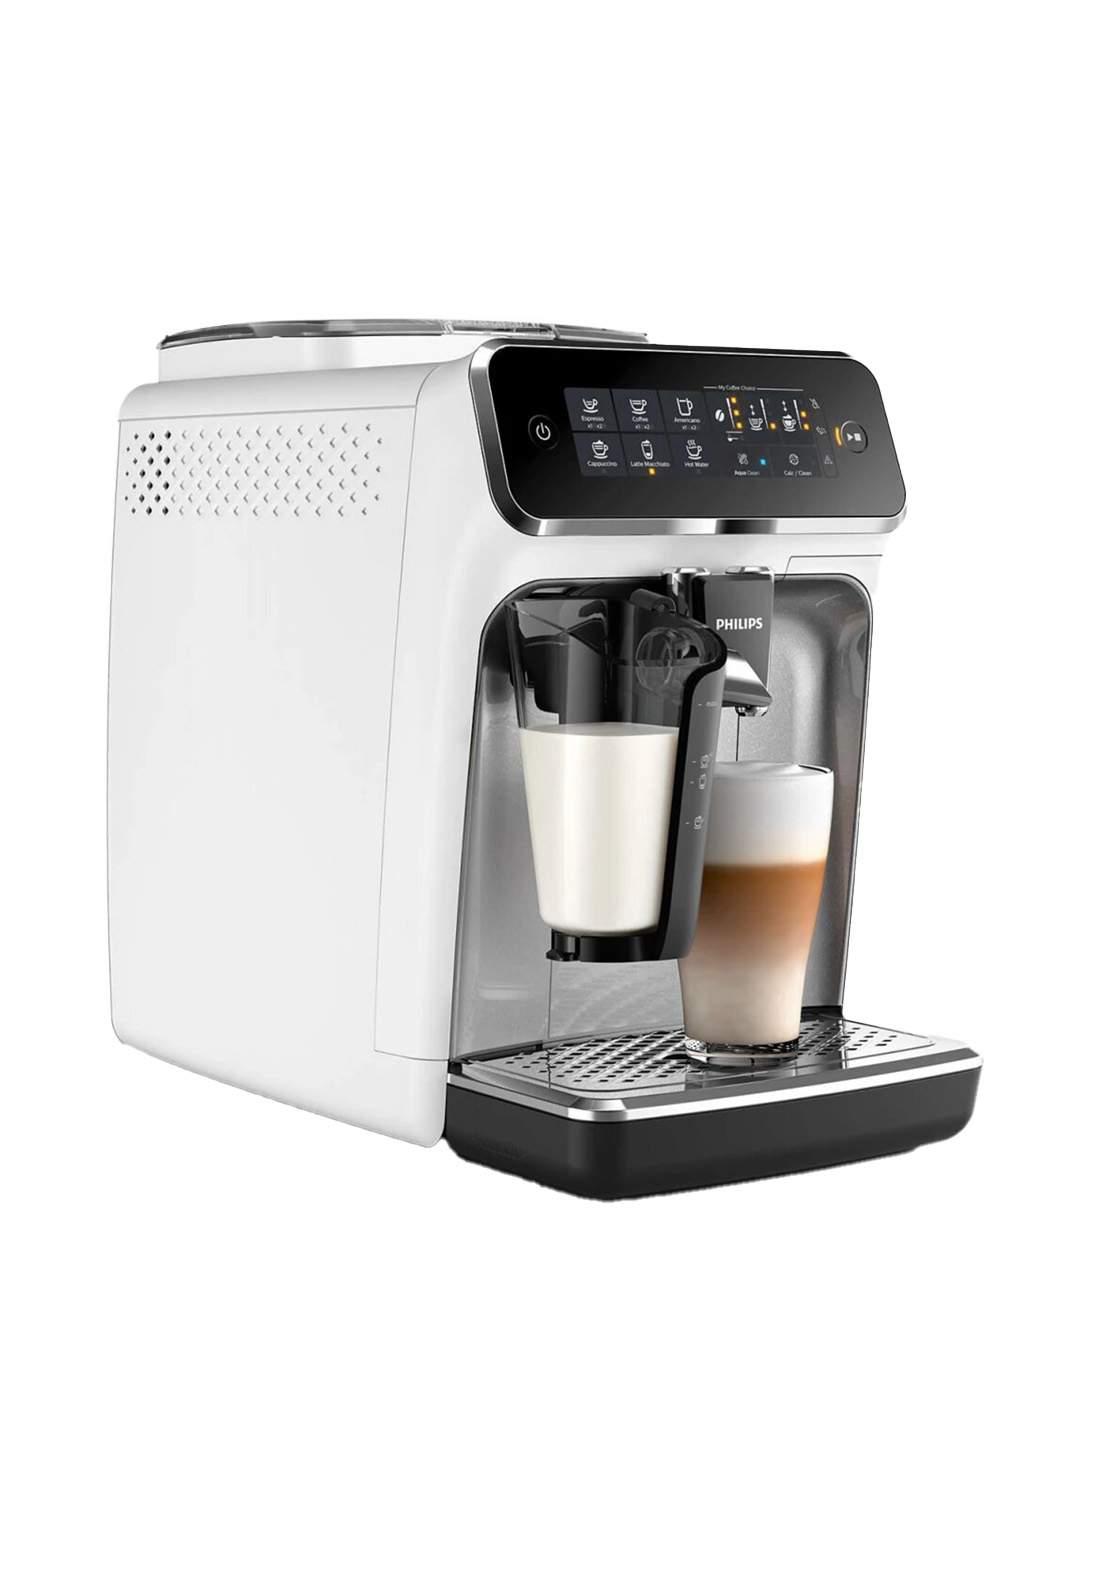 Philips EP3243 3200 Coffe Machine 1600 Watt ماكنة صنع القهوة